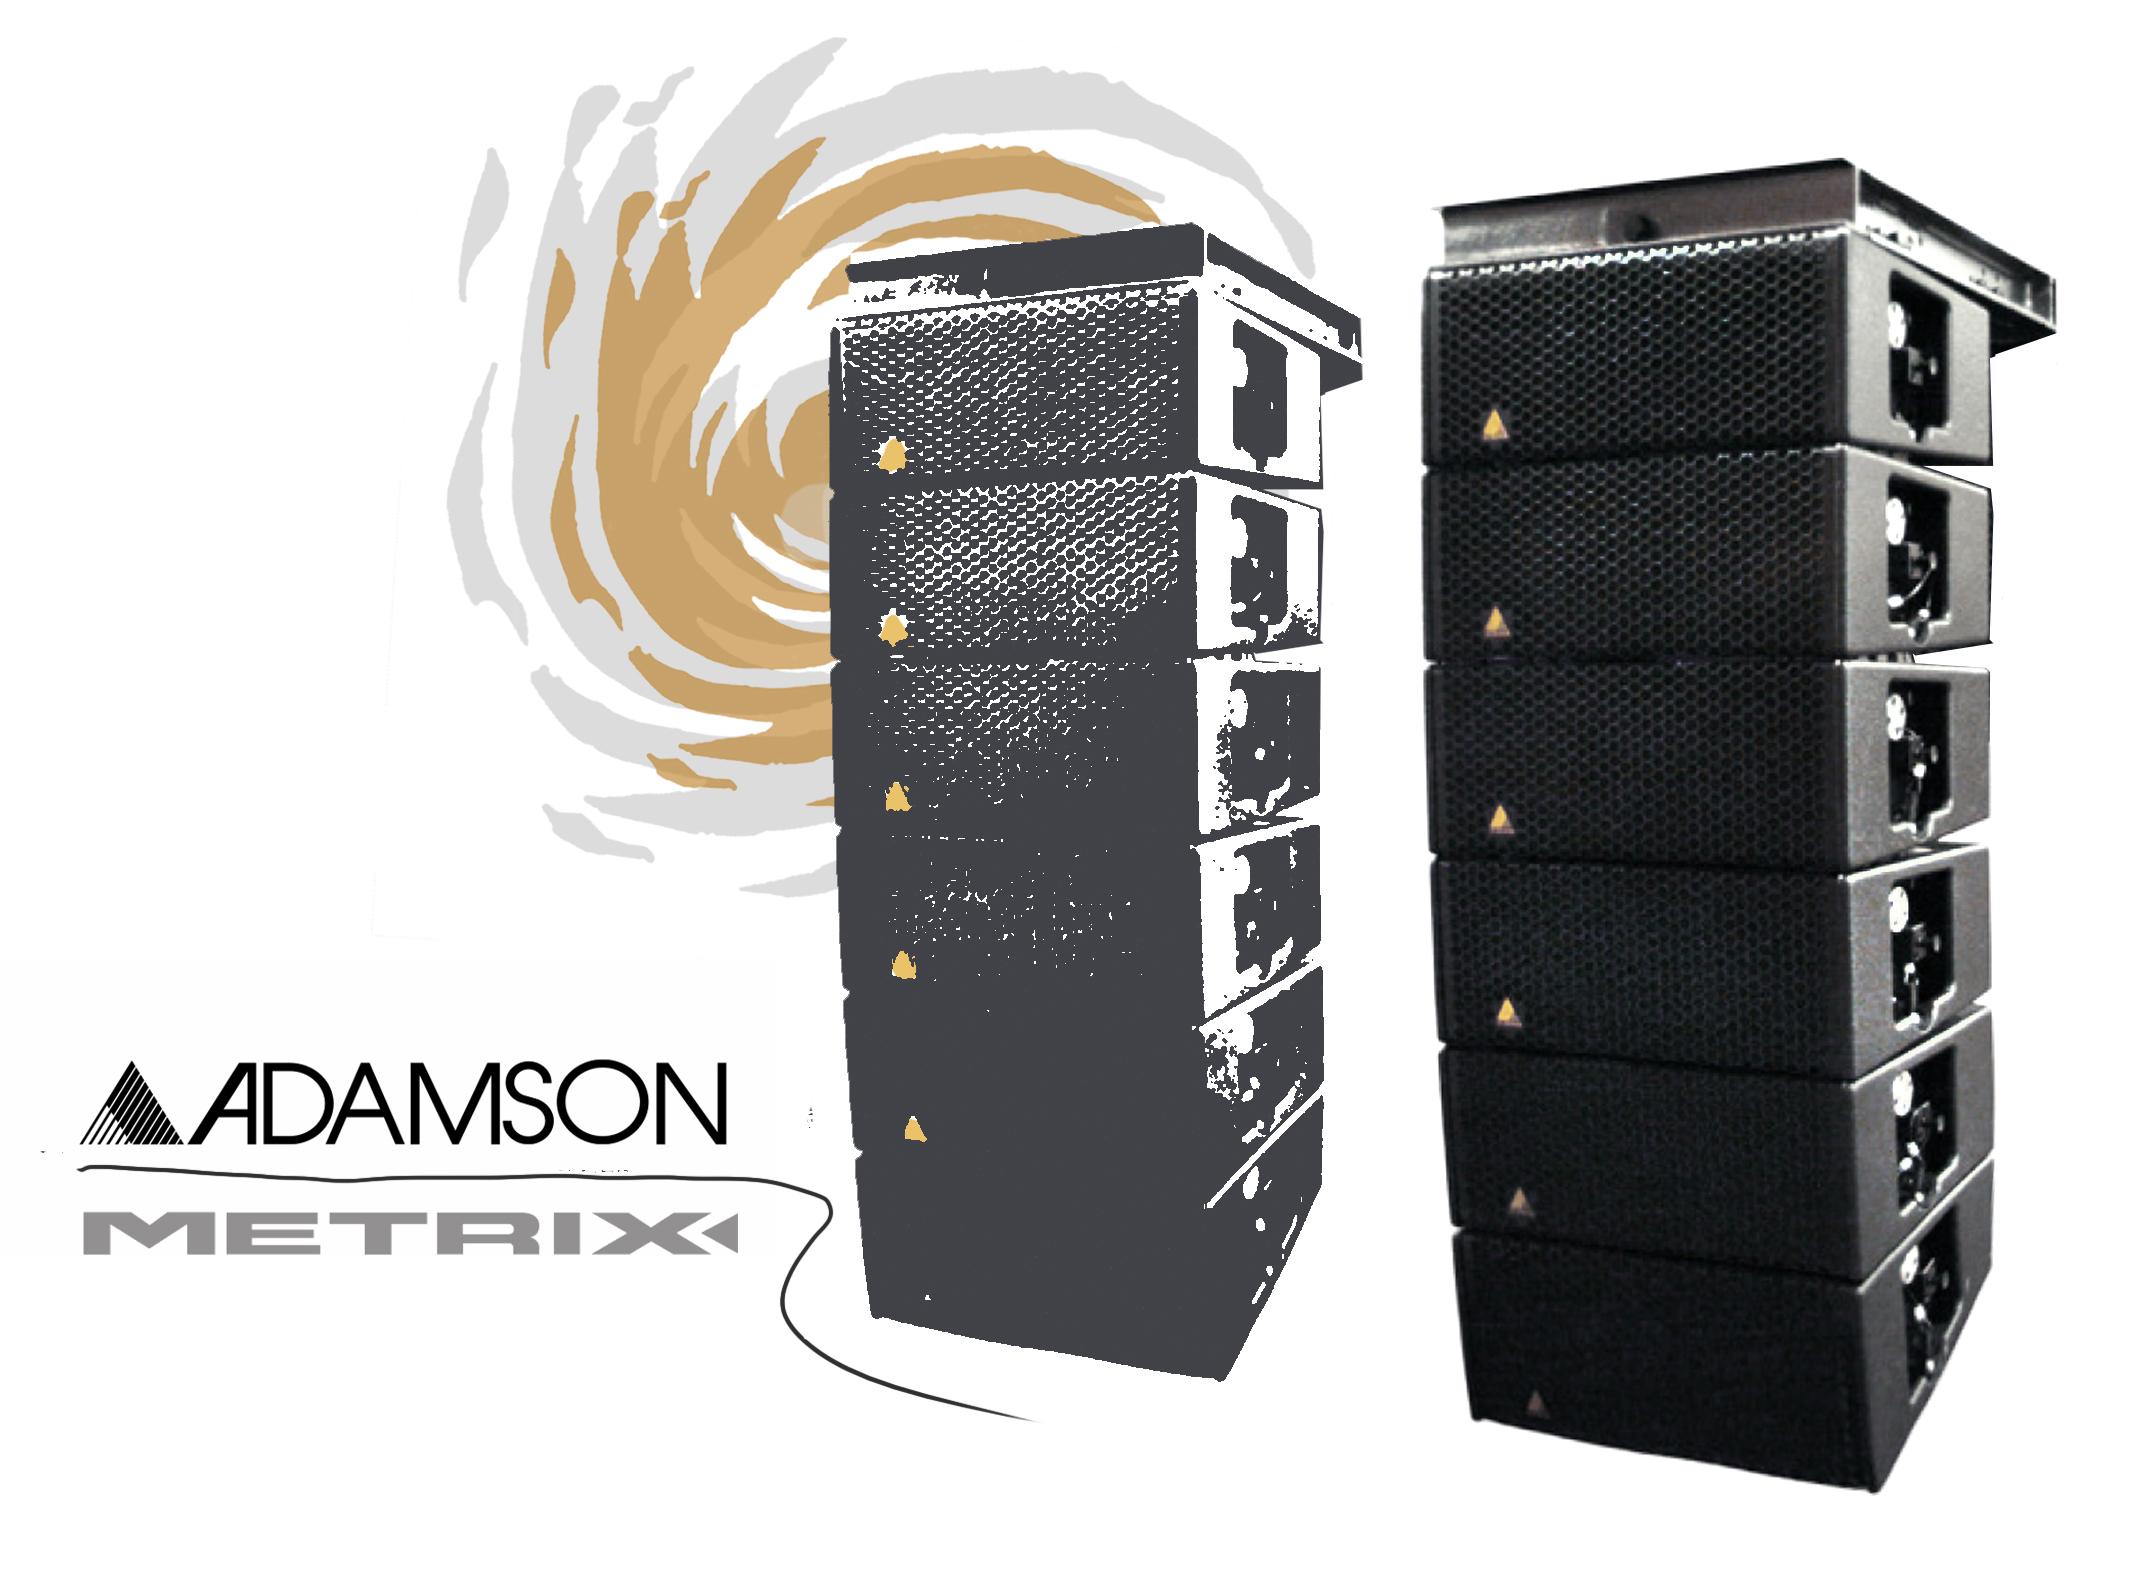 ADAMSON METRIX